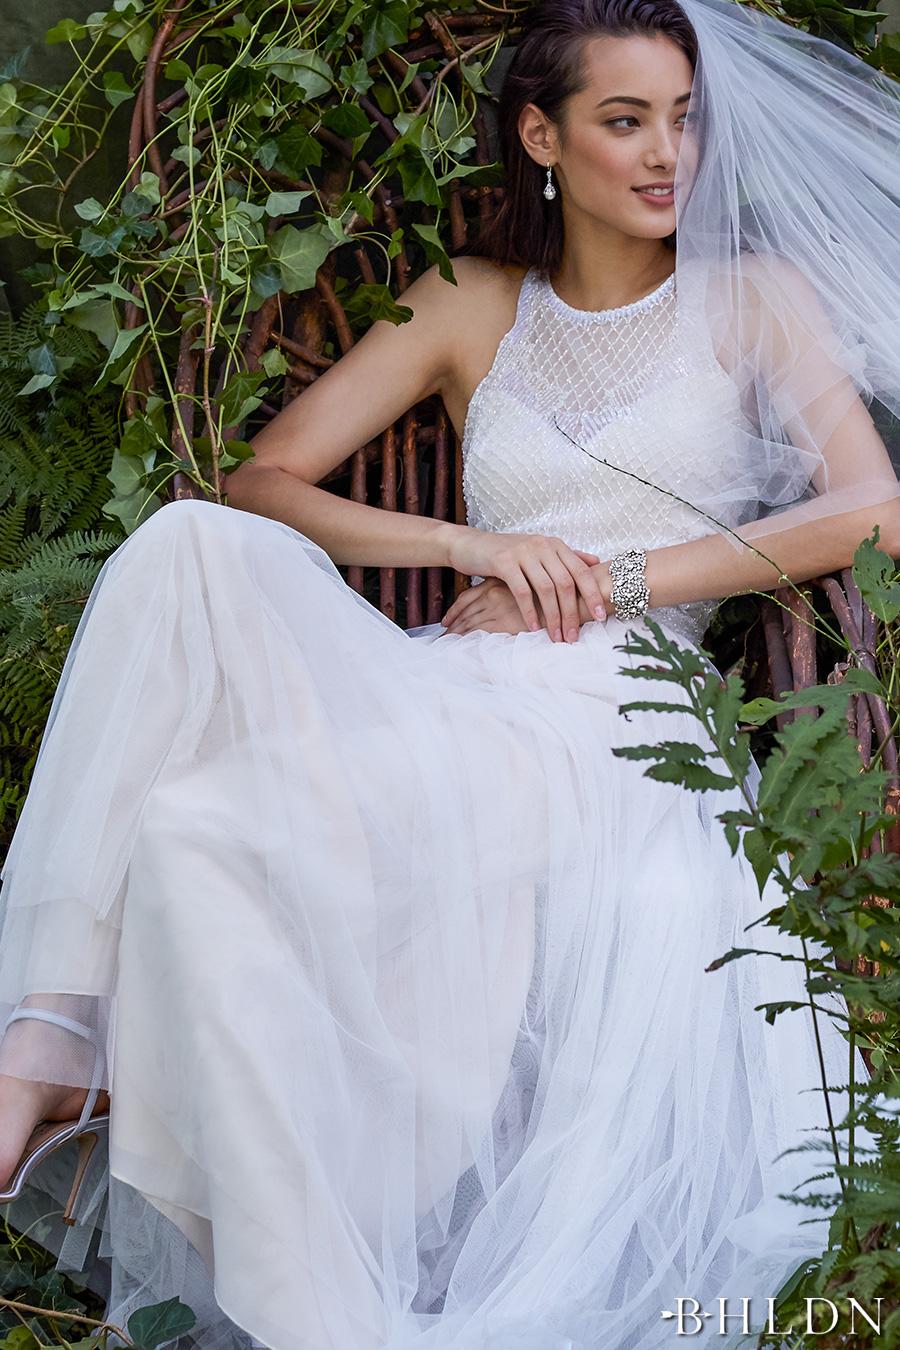 Fantasia Wedding Dresses 38 Ideal bhldn fall bridal sleeveless